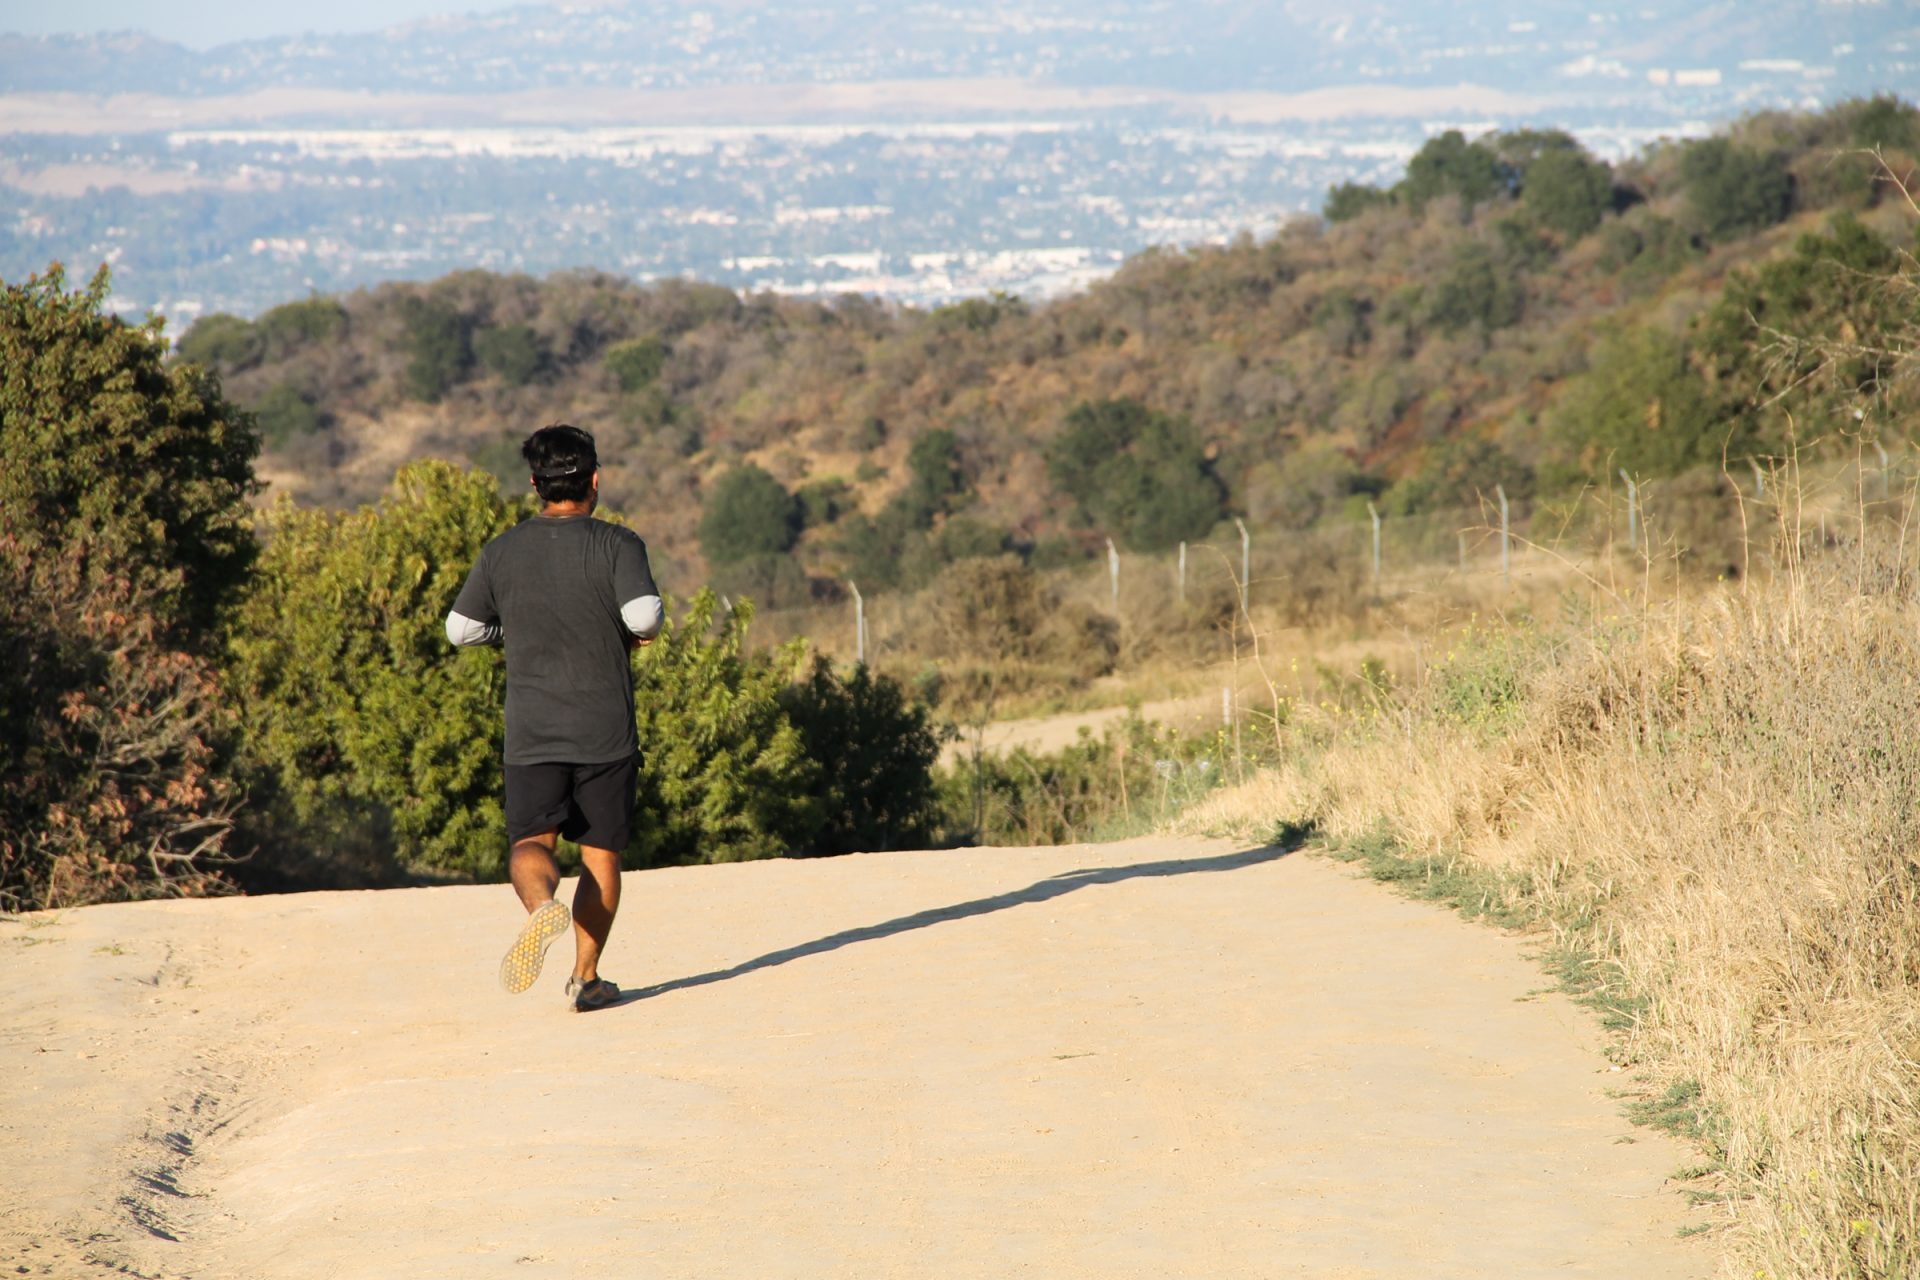 Man Running on Dry Dirt Trail